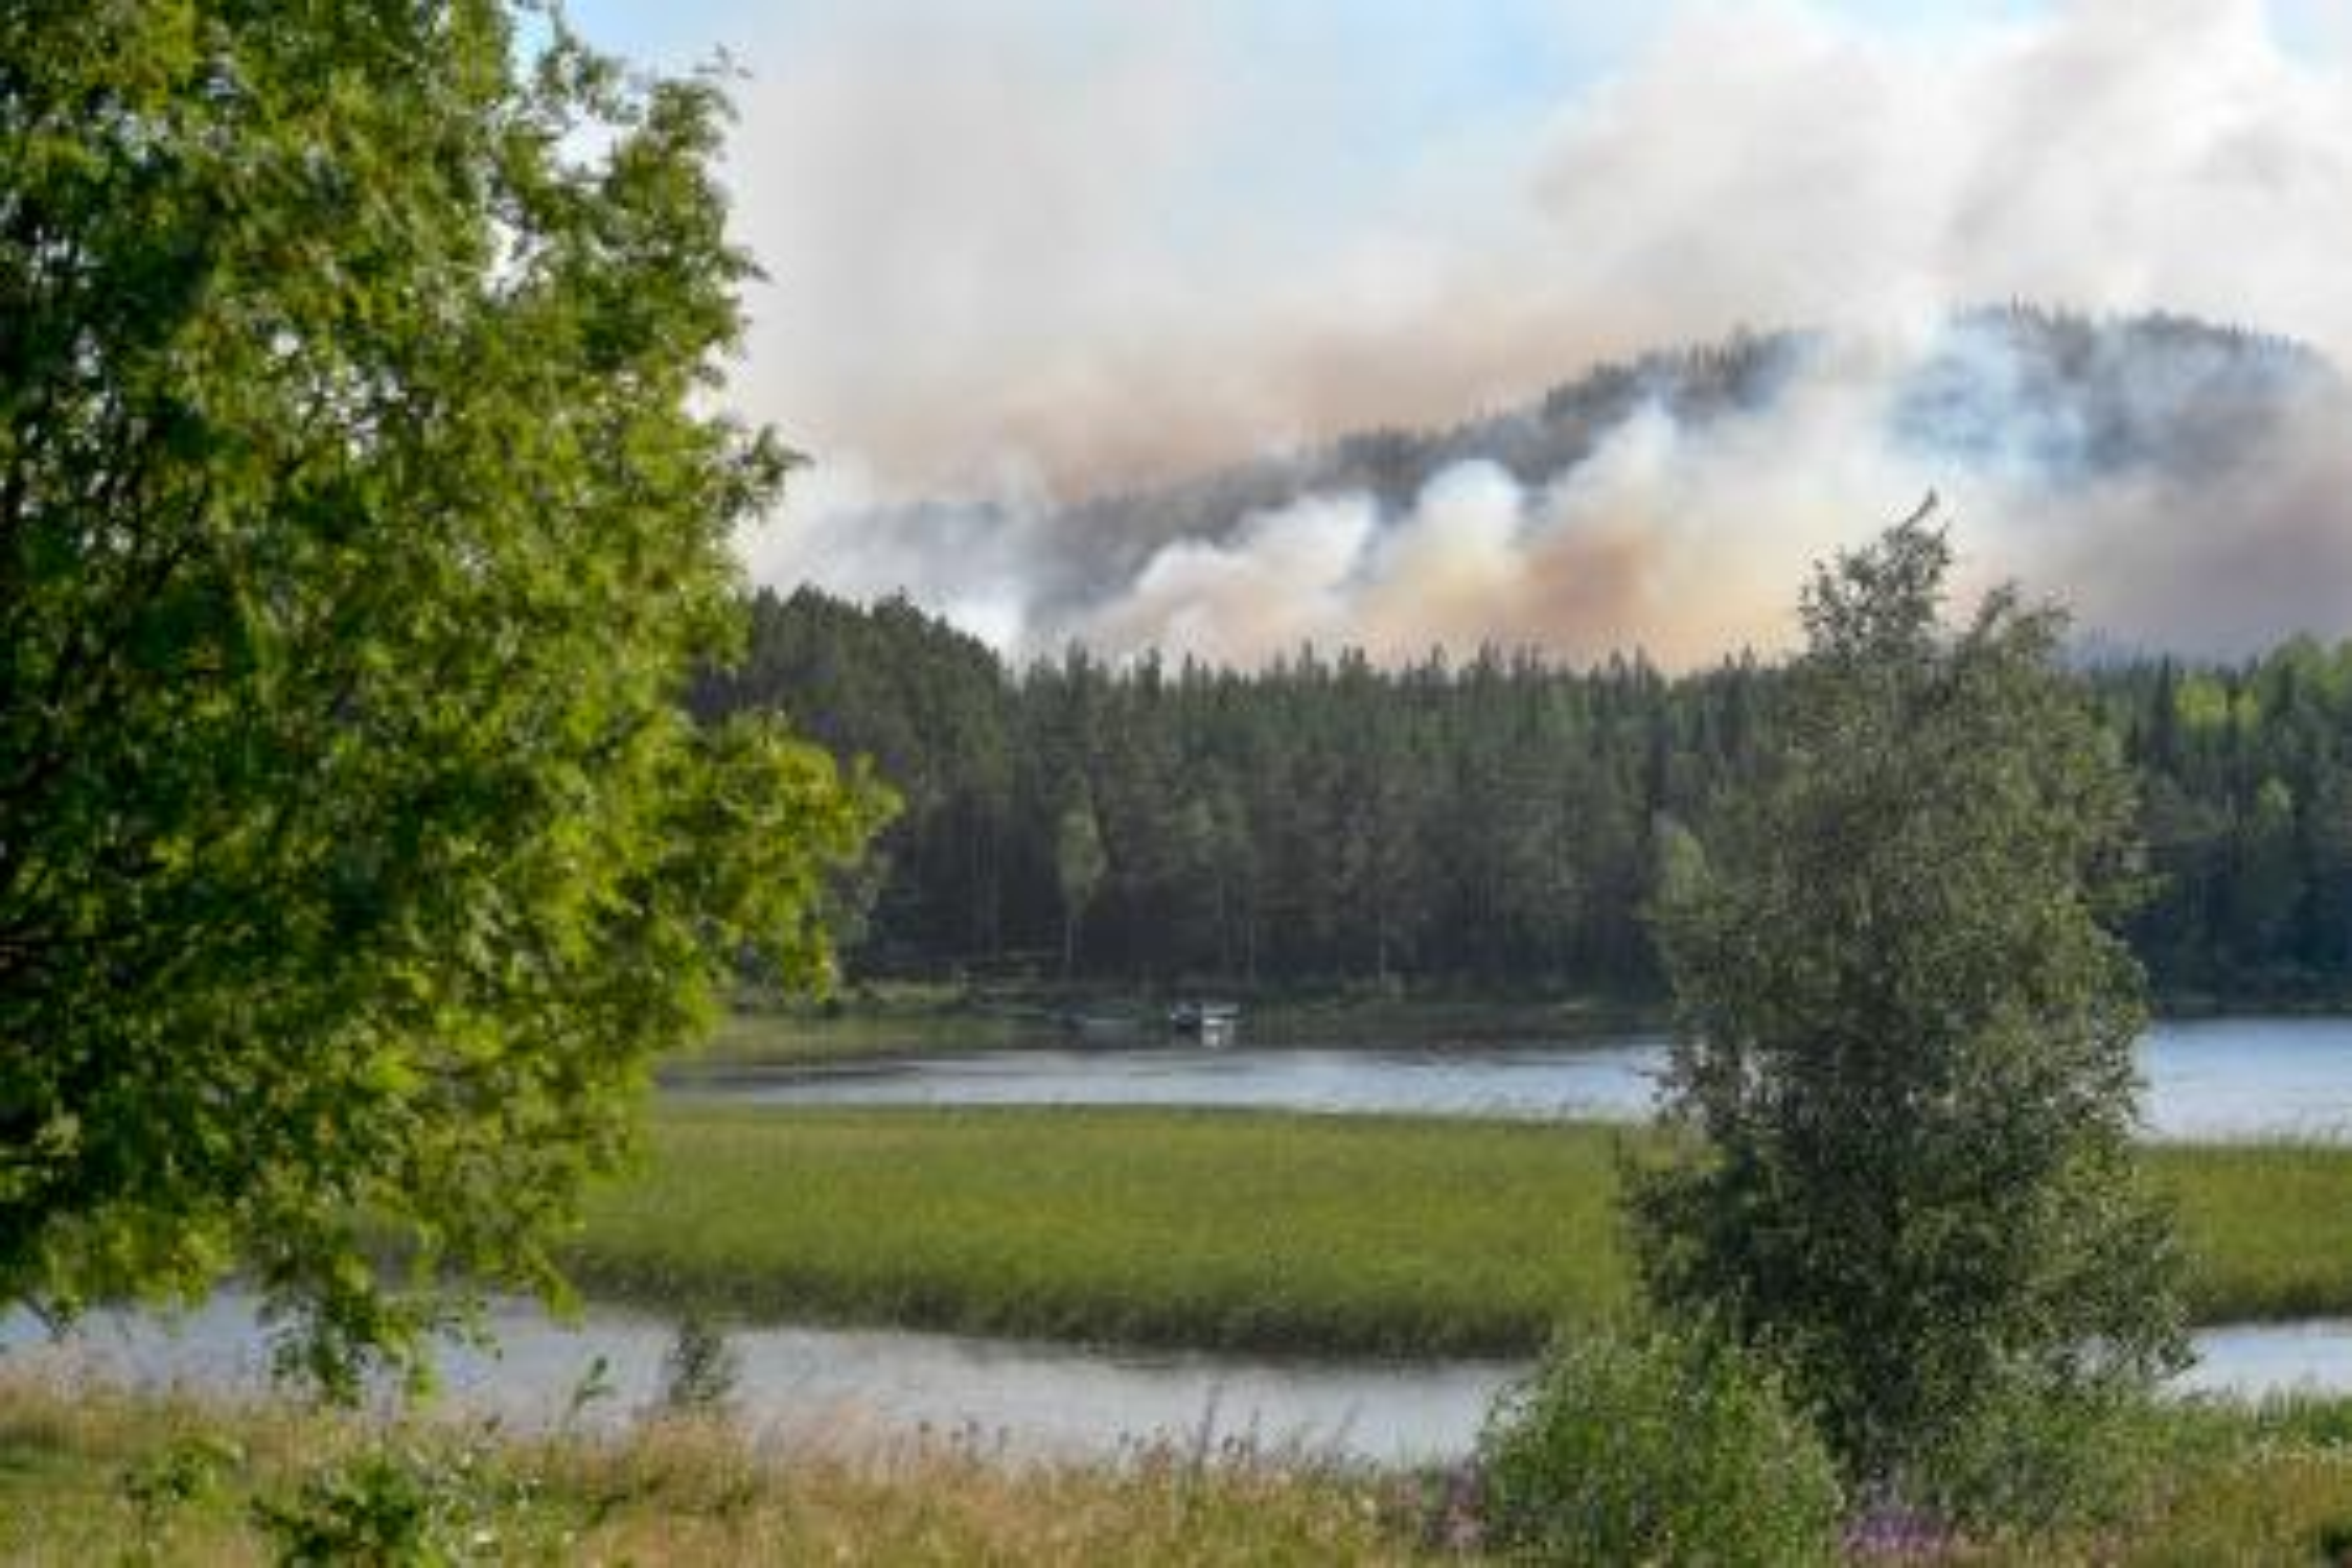 Sweden Wildfires